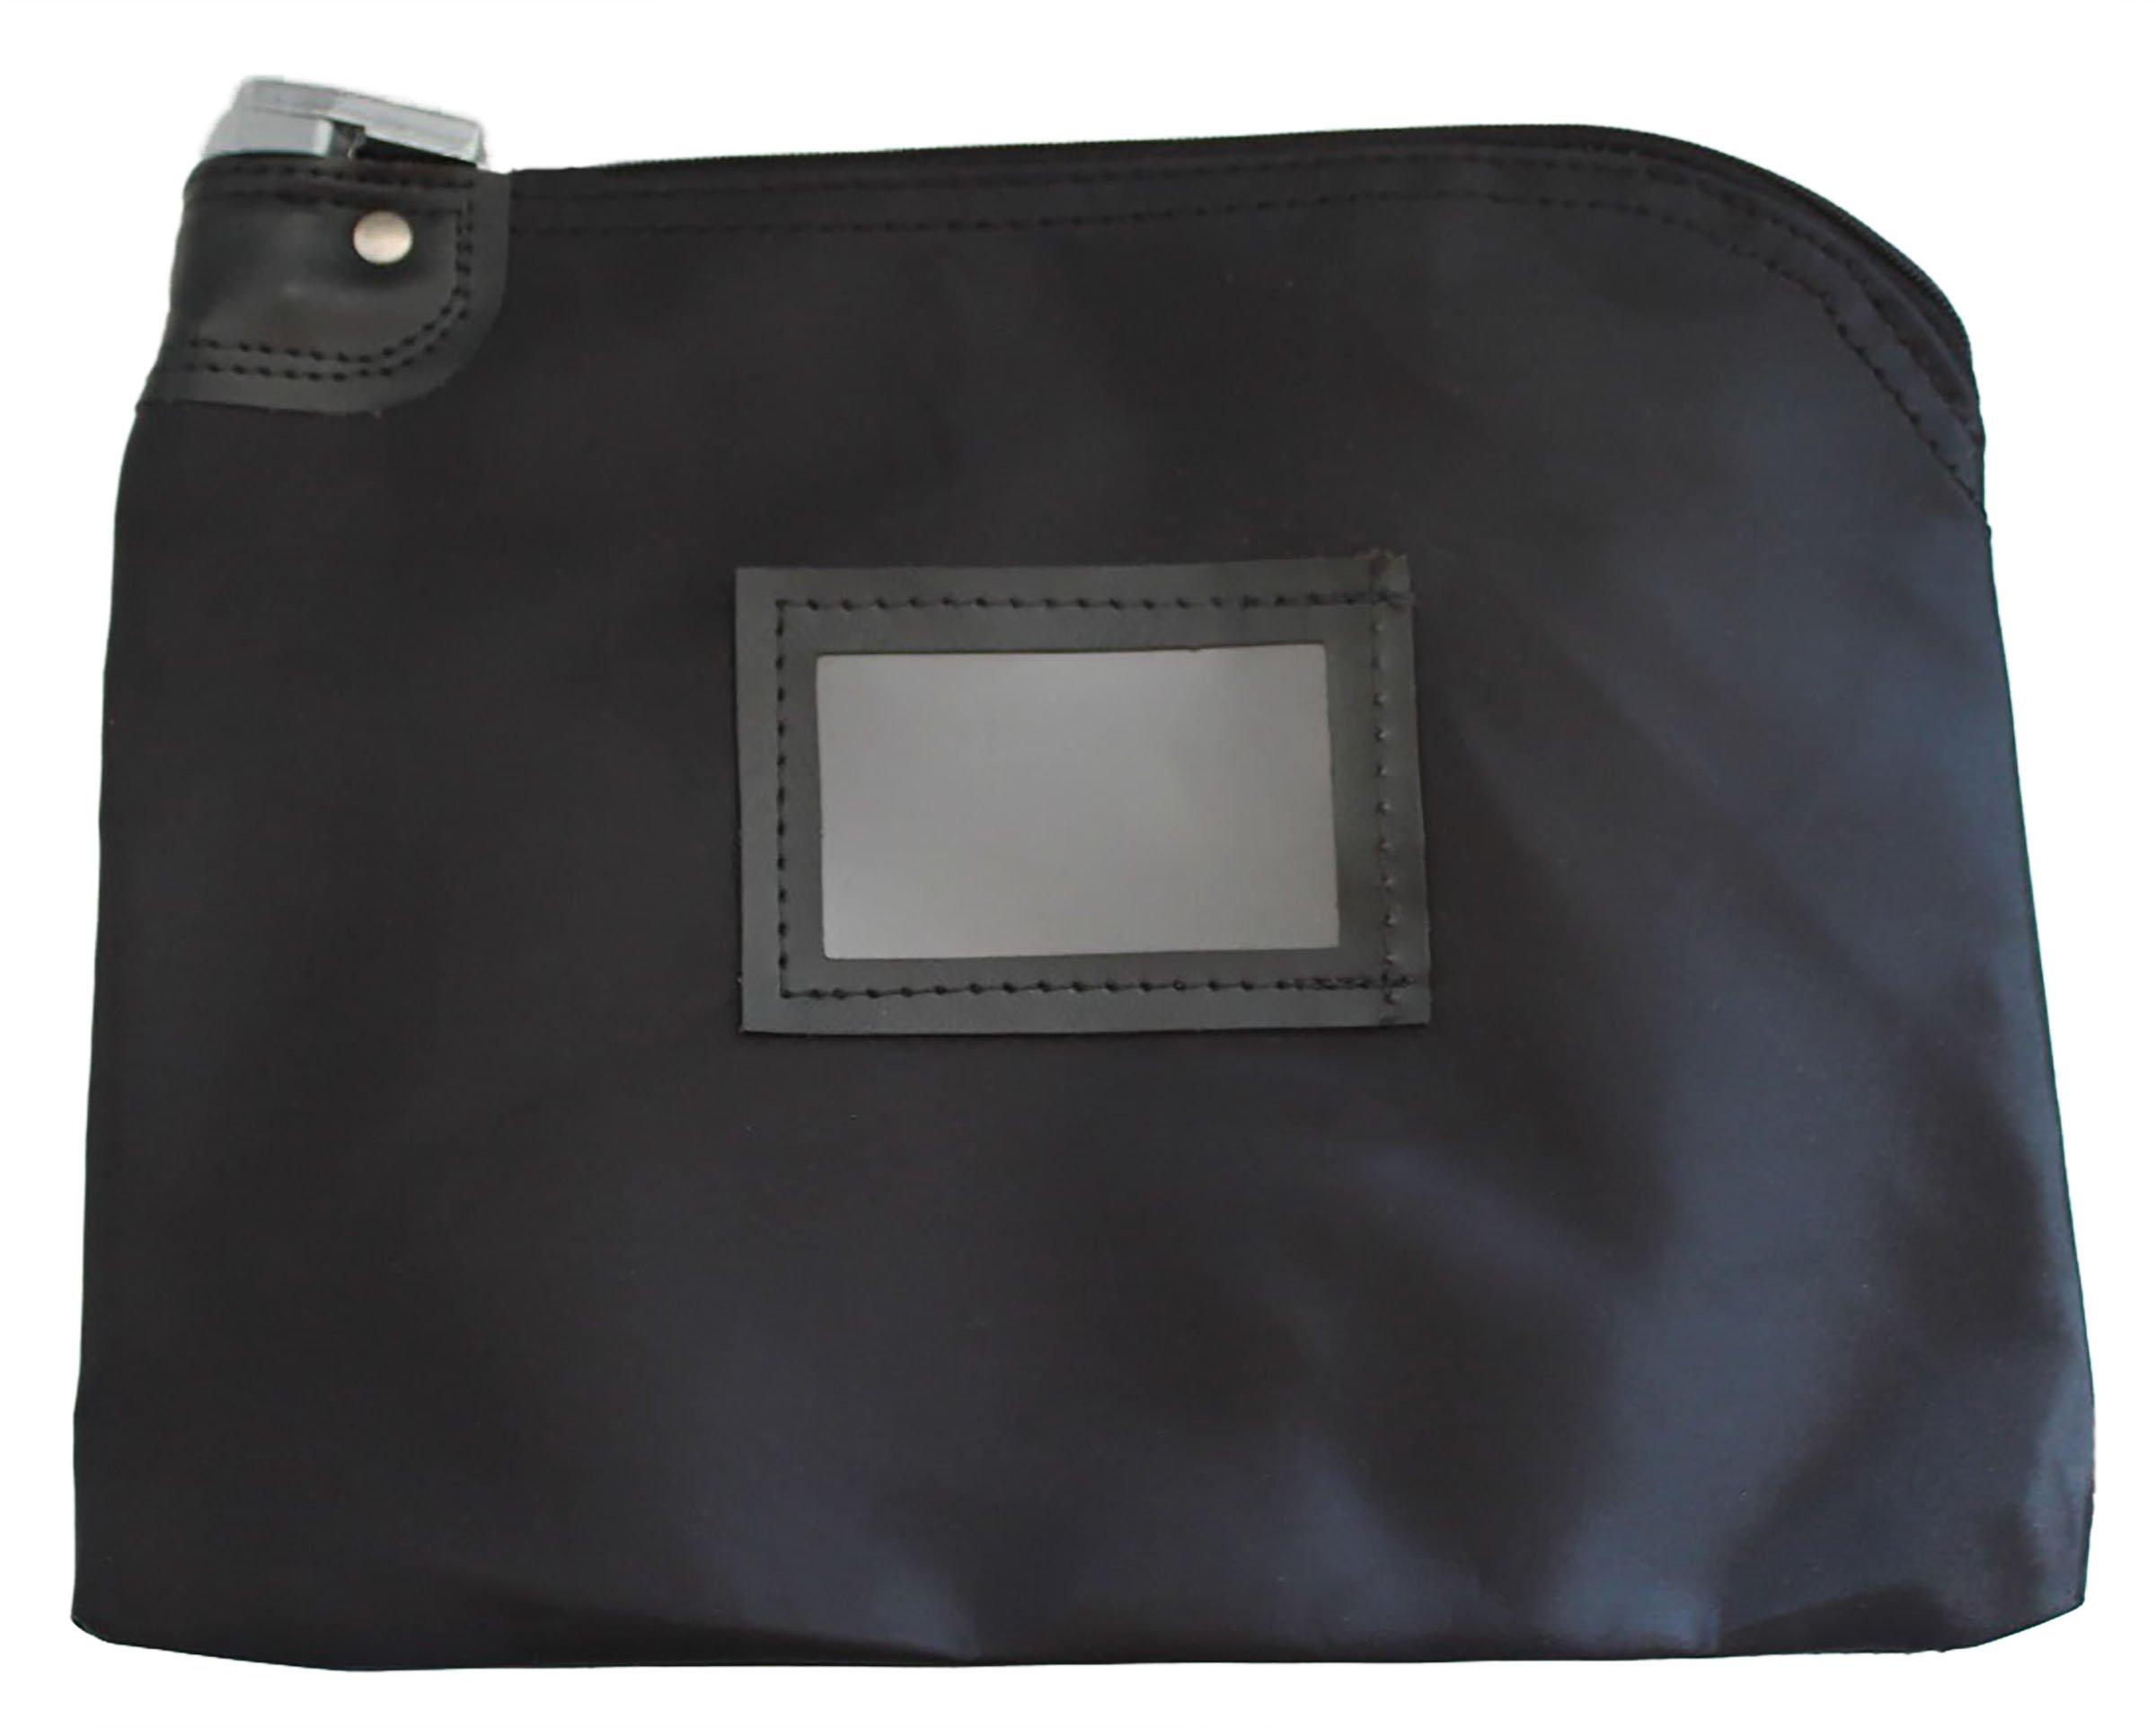 Locking Document Security HIPAA Bag 11 x 15 (Black)